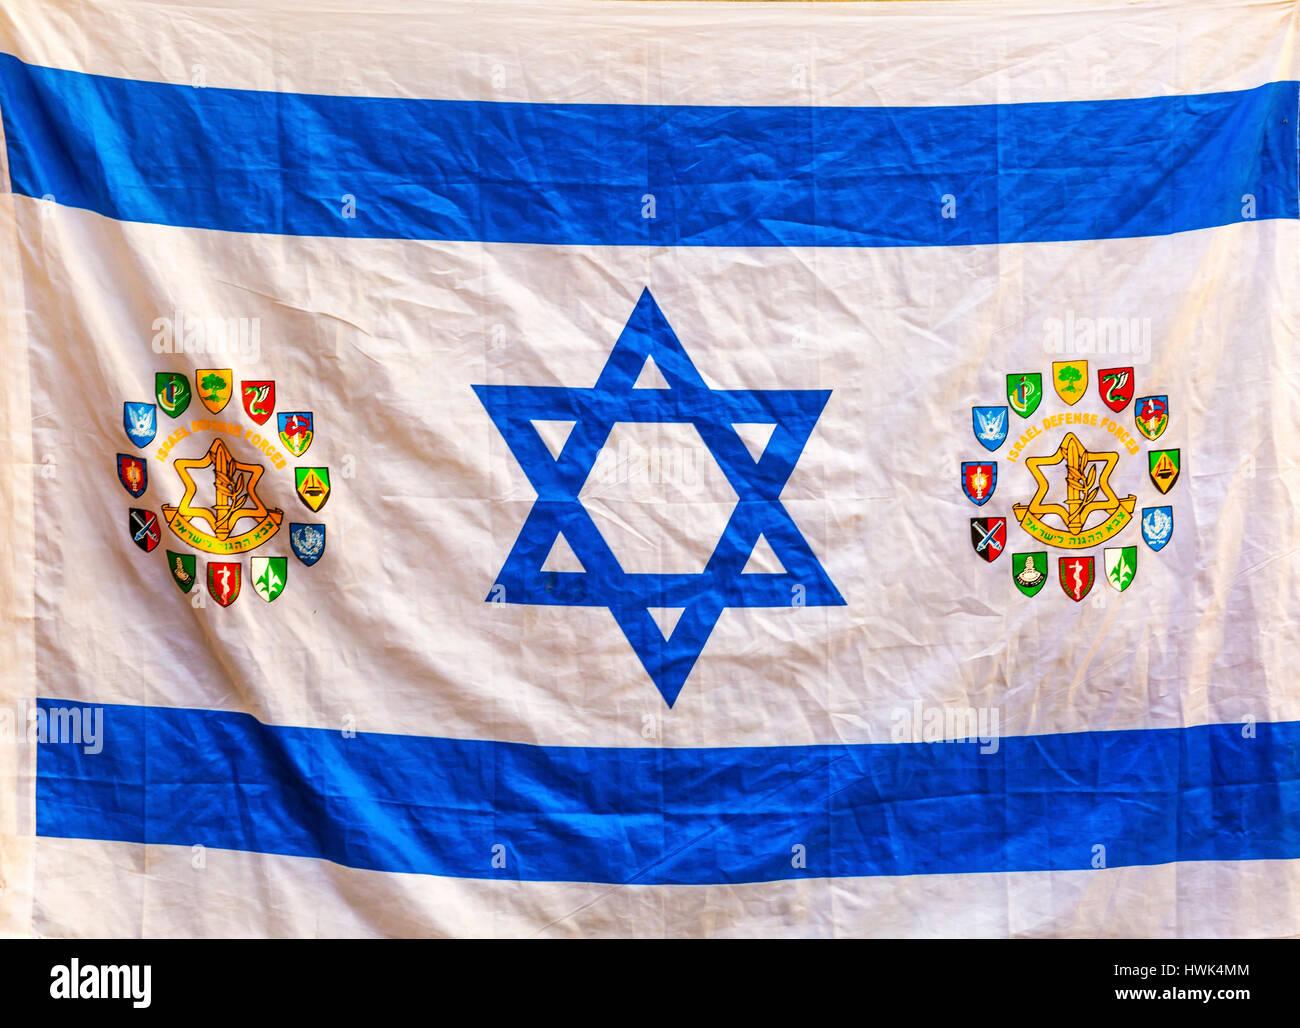 Israeli Flag Western Star of David Jerusalem Israel.  Israeli/Israel Flag with Symbots Different Divisions of IDF, - Stock Image